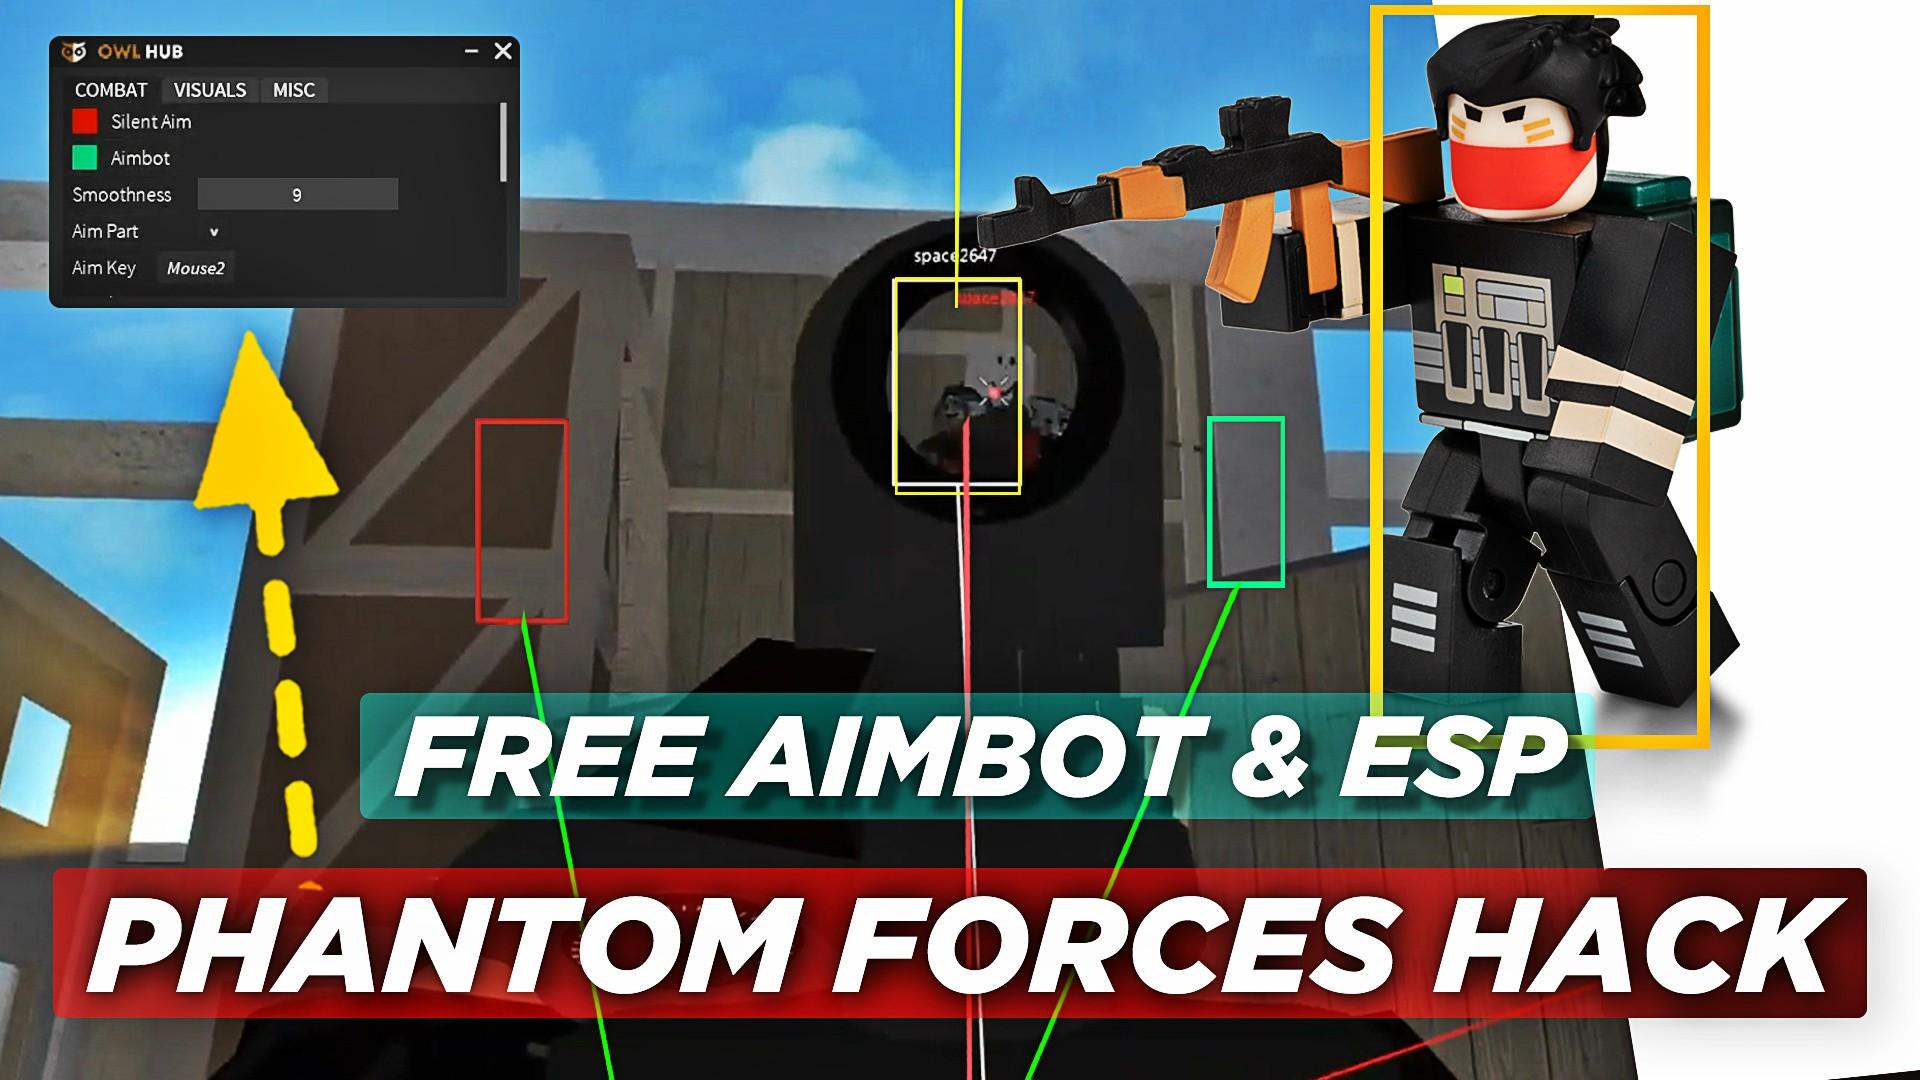 Aimbot Hack For Phantom Forces Roblox Phantom Forces Op Hack Gui Free Teletype